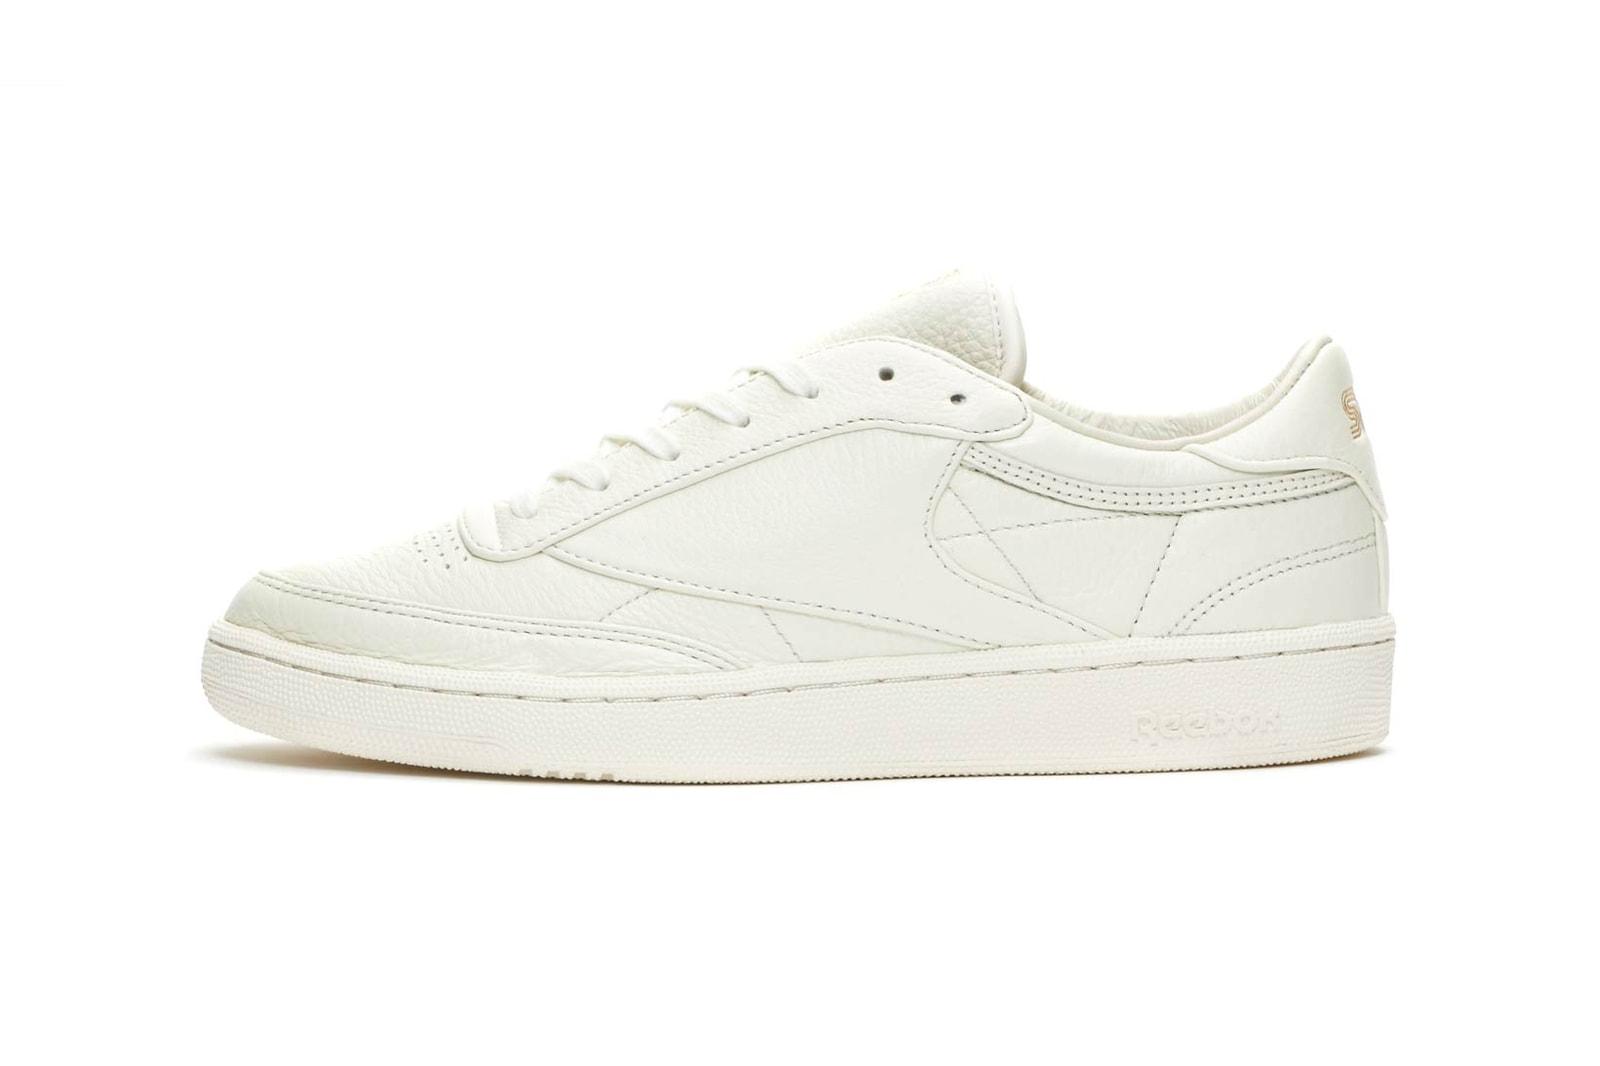 9bea04b342c Sneakersnstuff x Reebok s New Club C 85 Premium